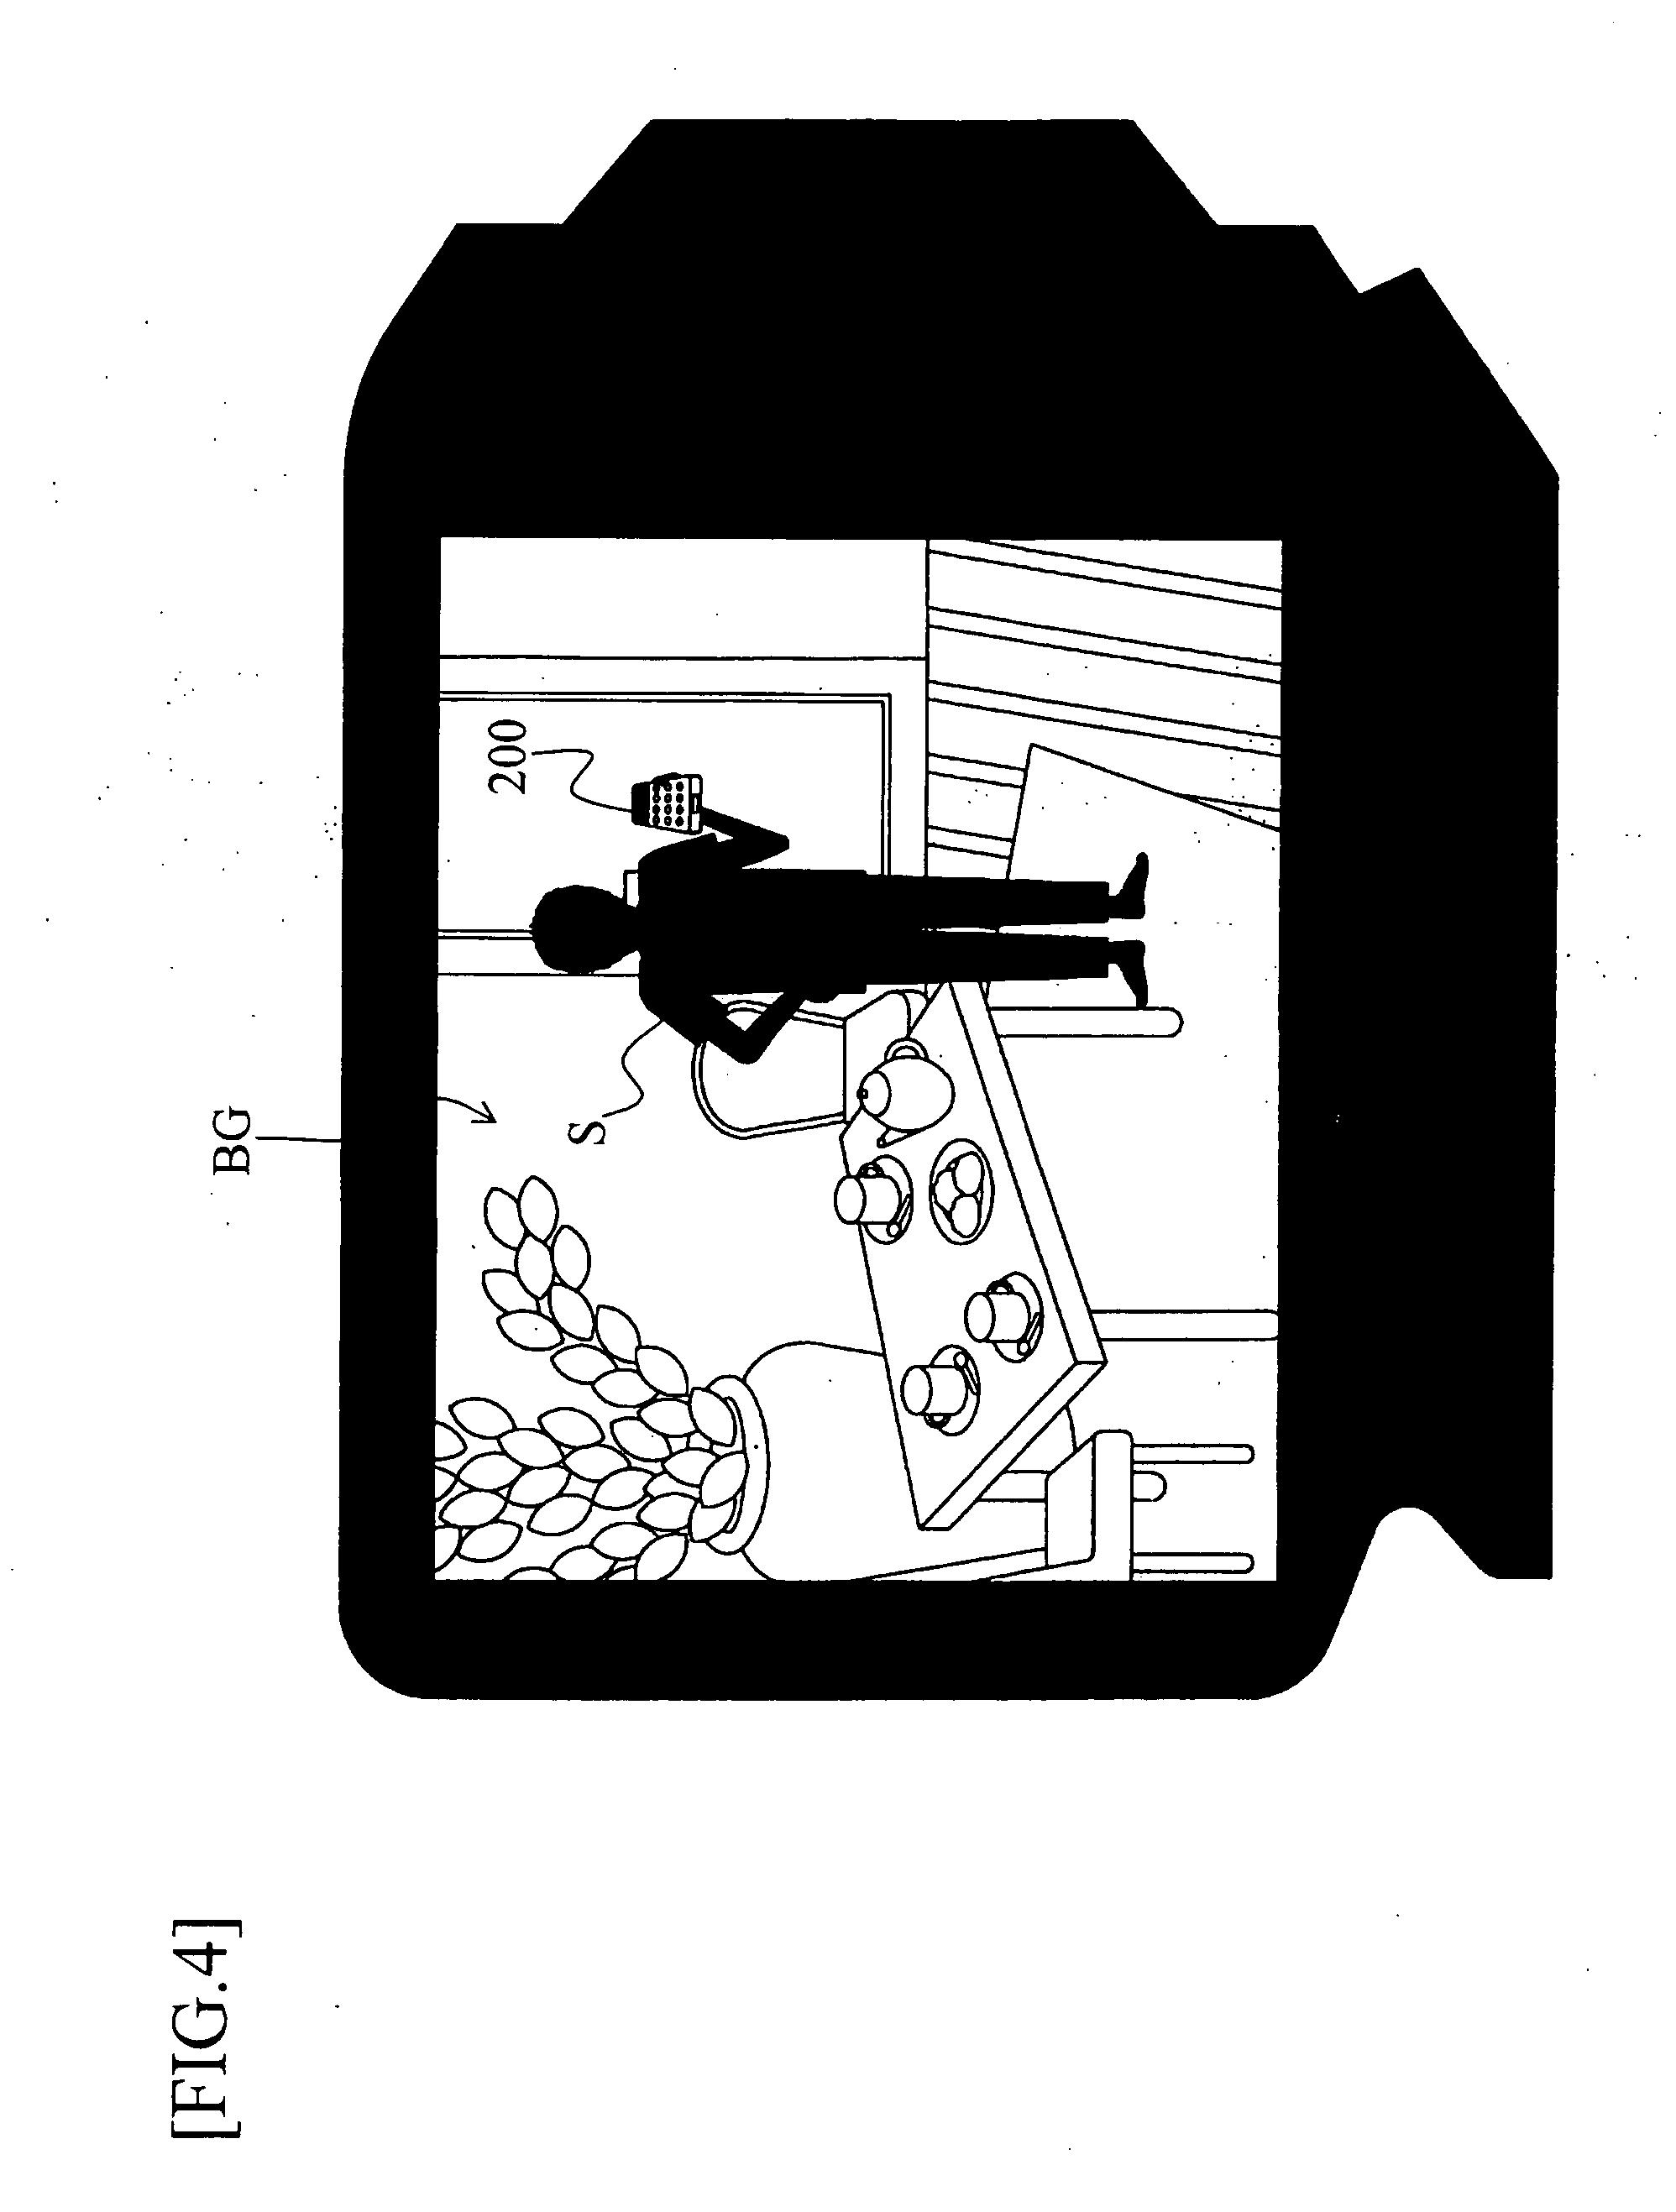 براءة الاختراع US20100141578.